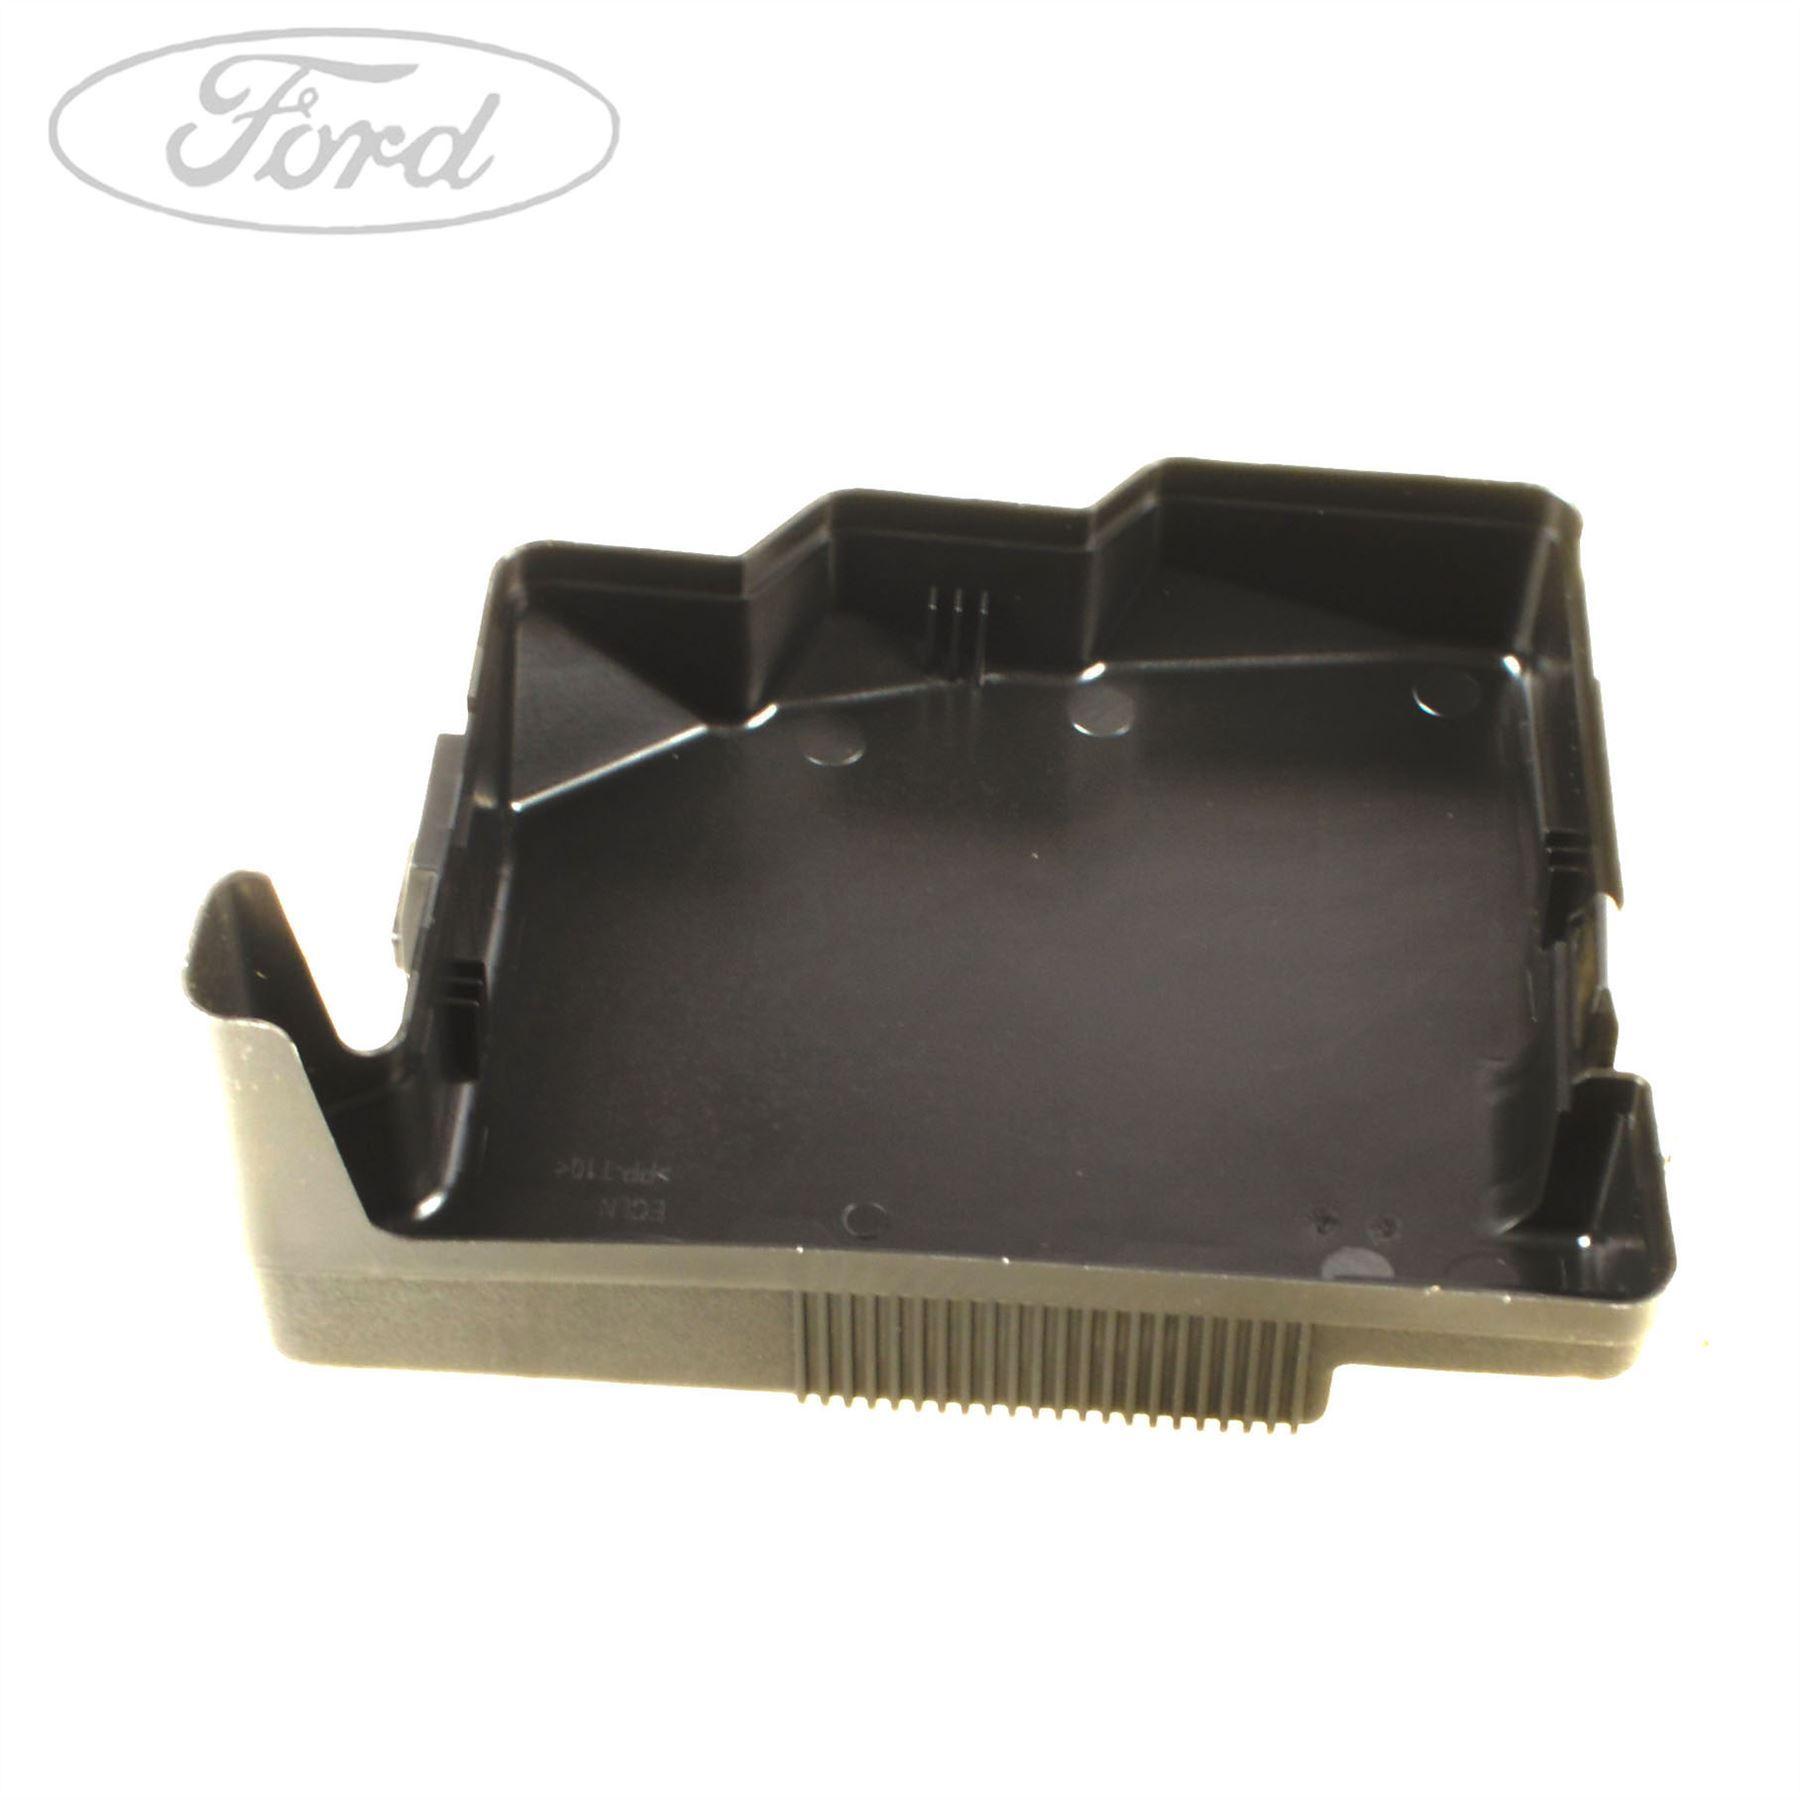 Genuine Ford Fiesta Mk7 Fuse Box Cover 1515045 Ebay